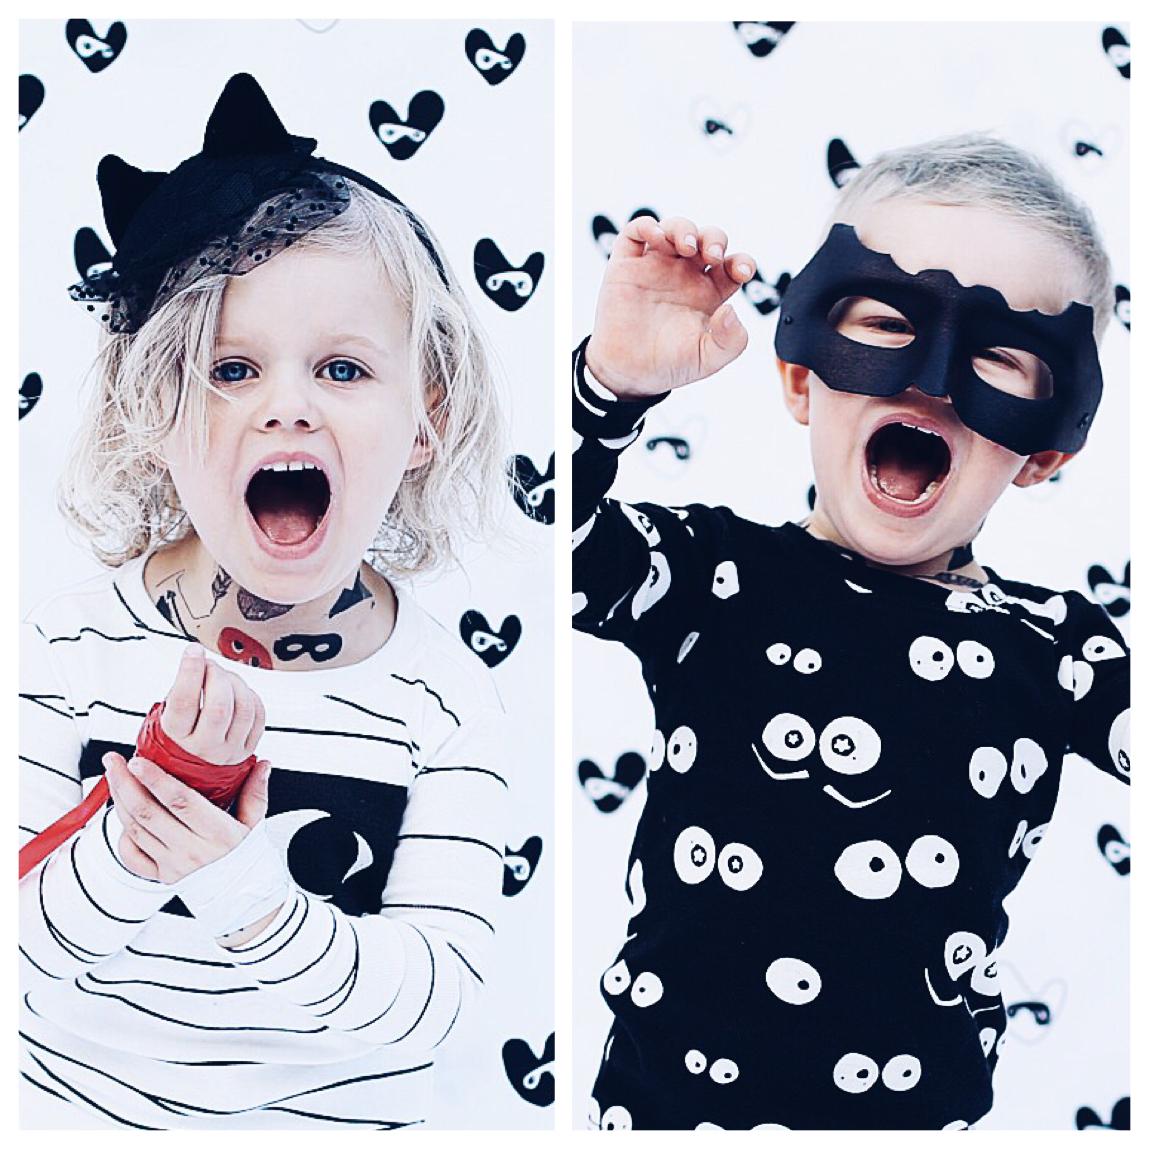 gap halloween sleep sets 02 beau loves temporary tattoos 03 hm headband with netting 04 custom made batman mask 05 beau loves cap from monkey